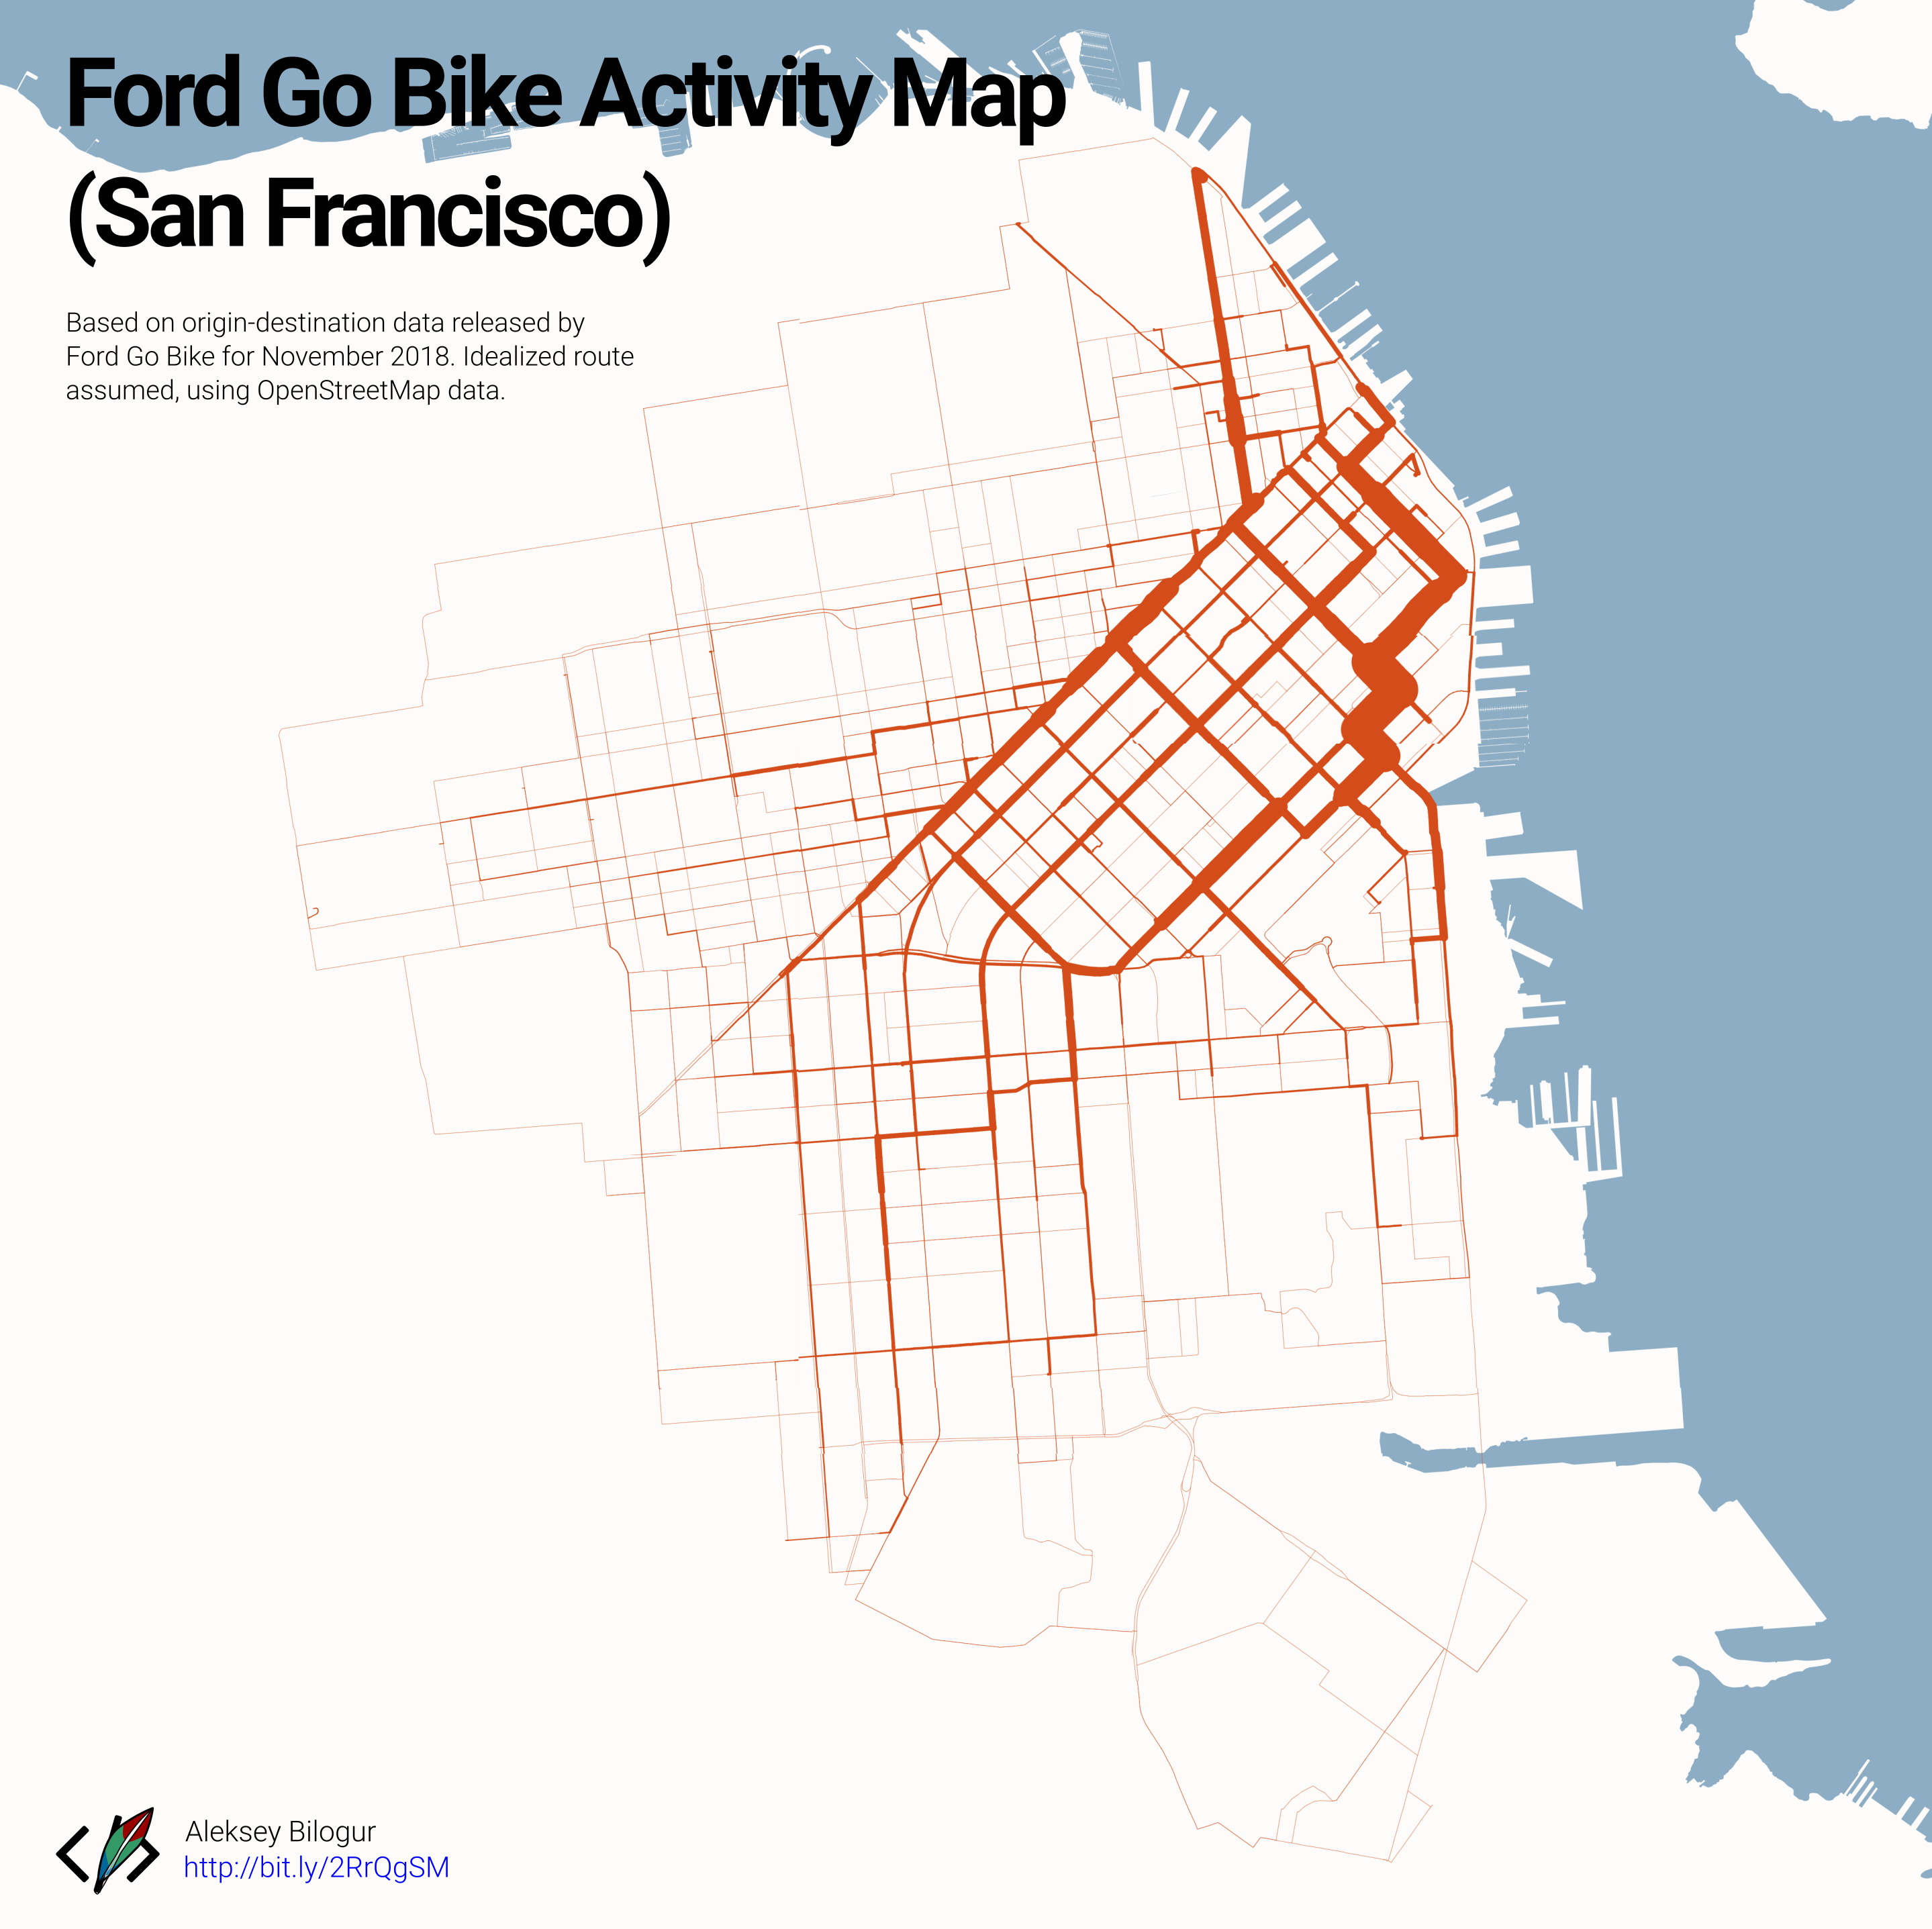 San Francisco Ford Go Bike activity map [OC] : sanfrancisco